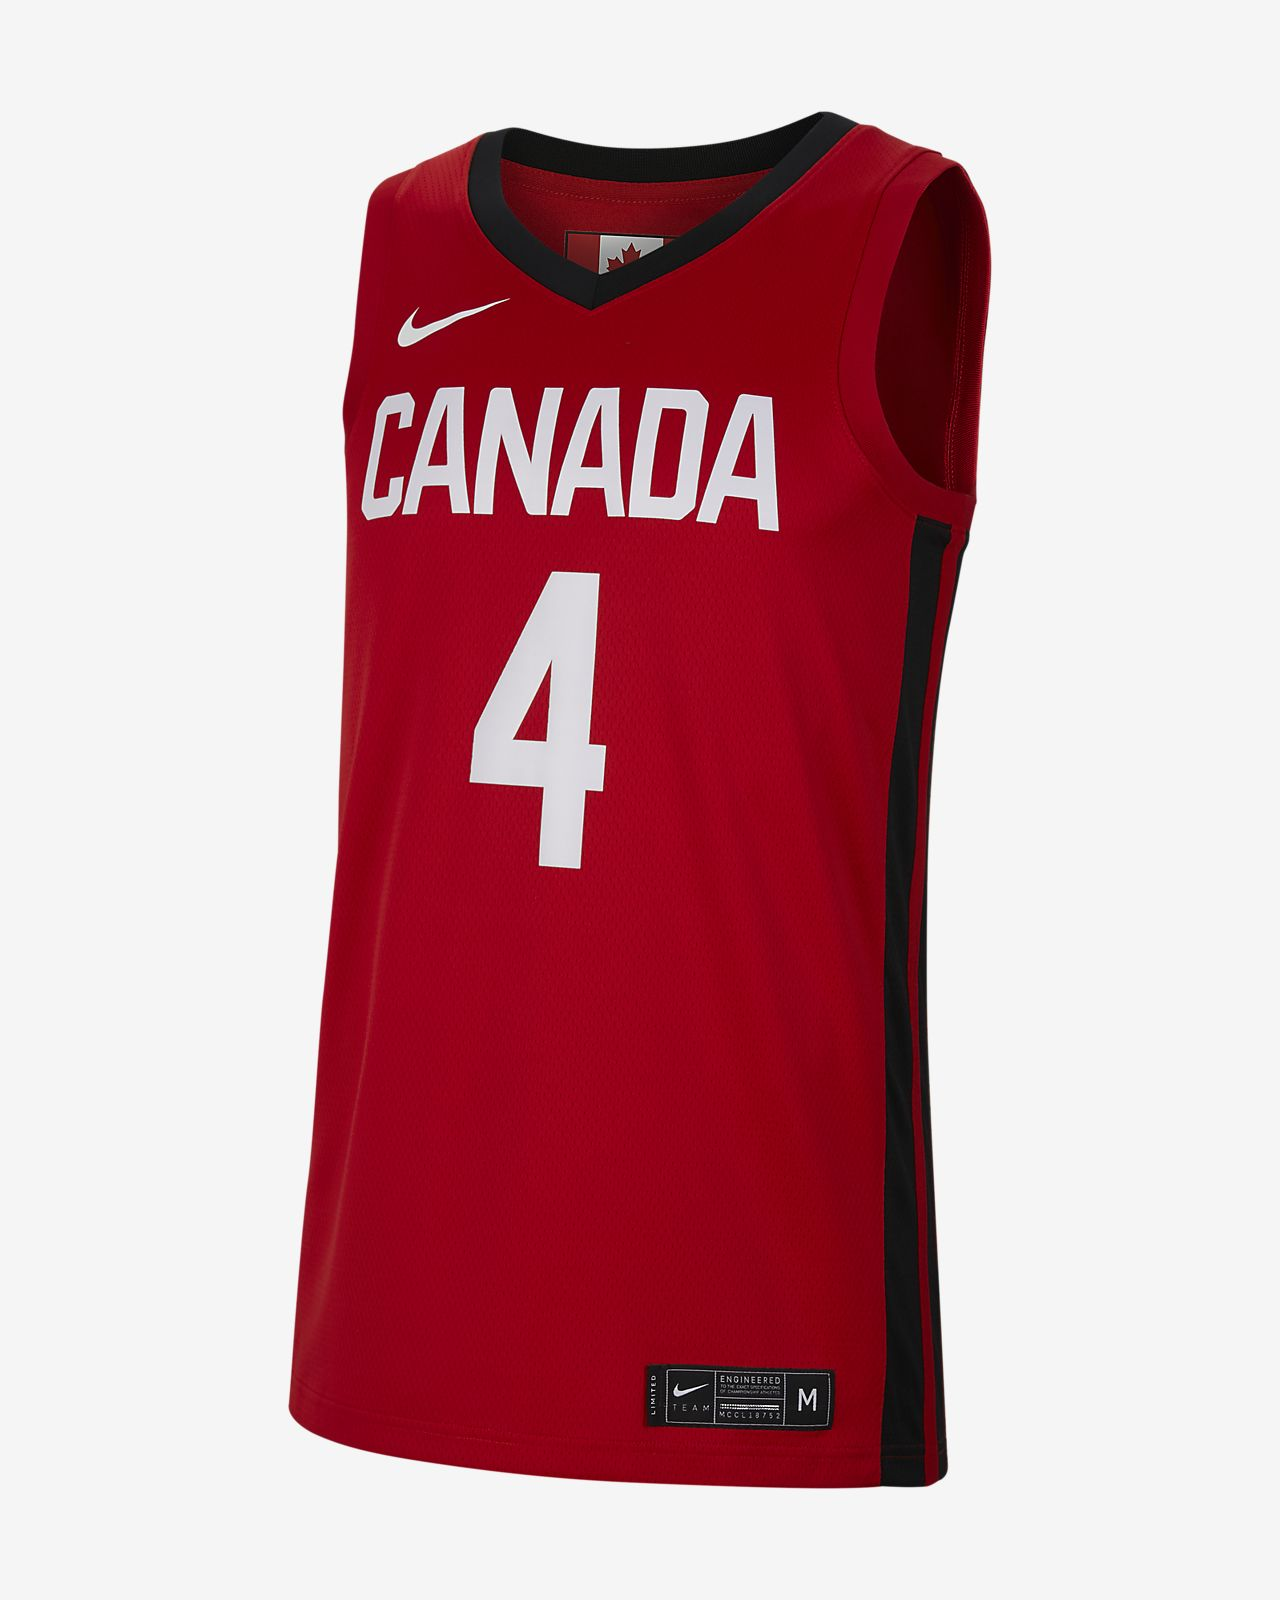 Maglia da basket Canada Nike (Road) - Uomo